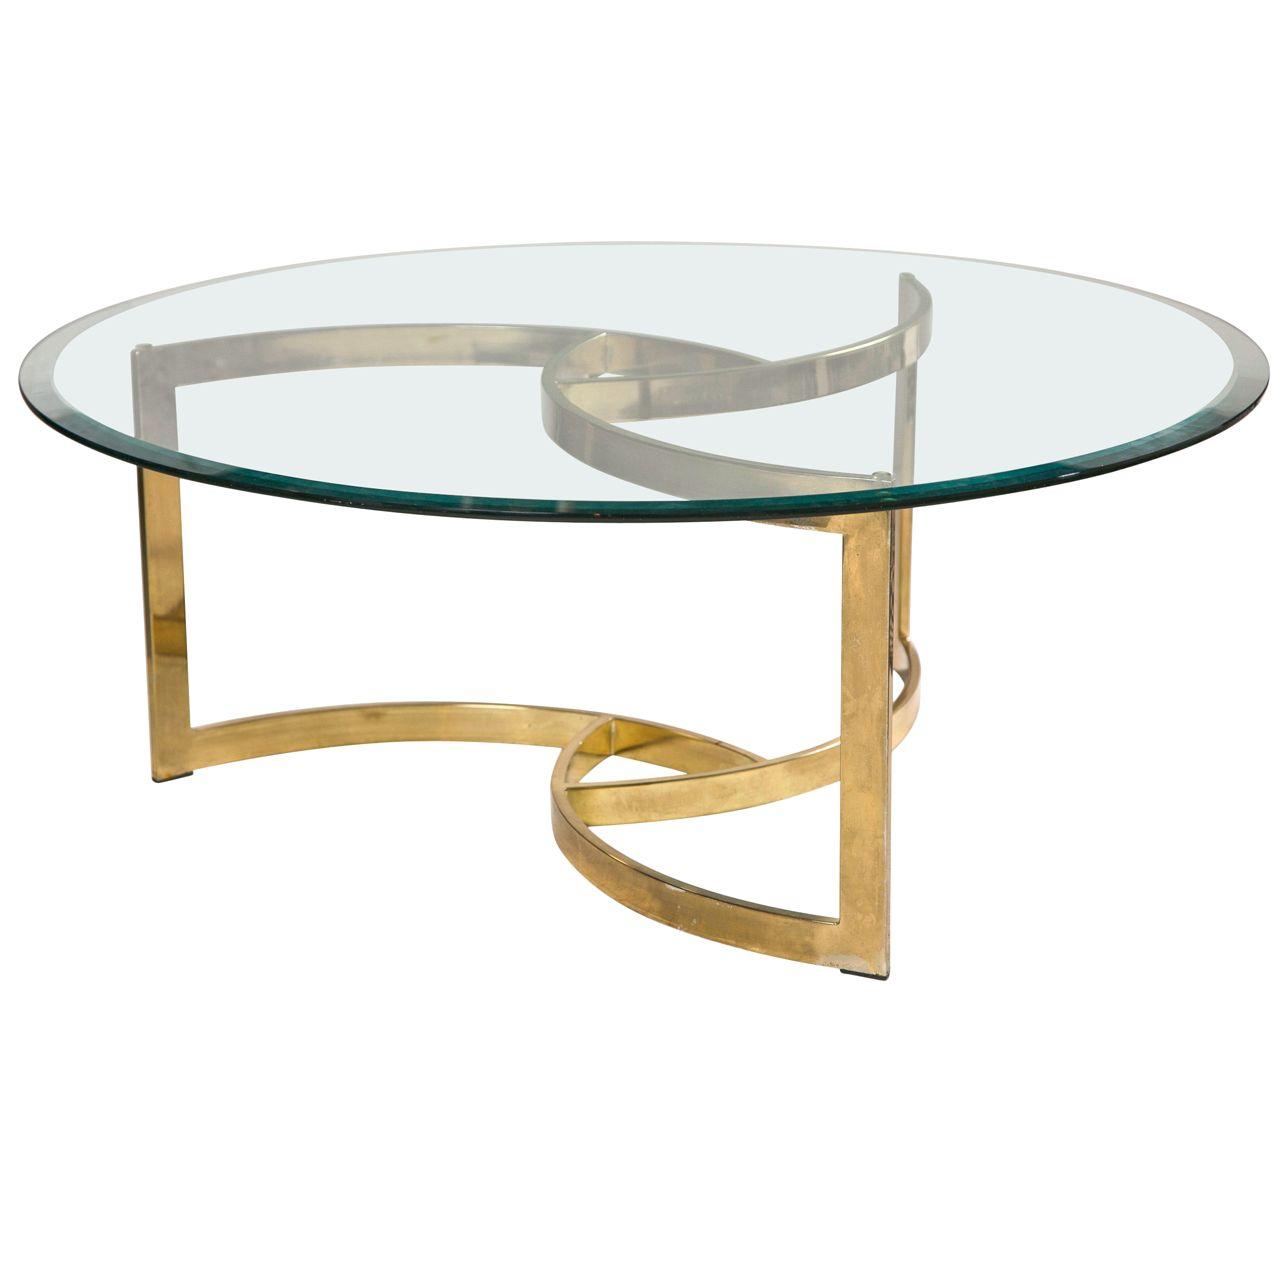 Mid Century Brass Swirl Base With Round Glass Top Coffee Table Round Glass Coffee Table Brass Coffee Table Modern Glass Coffee Table